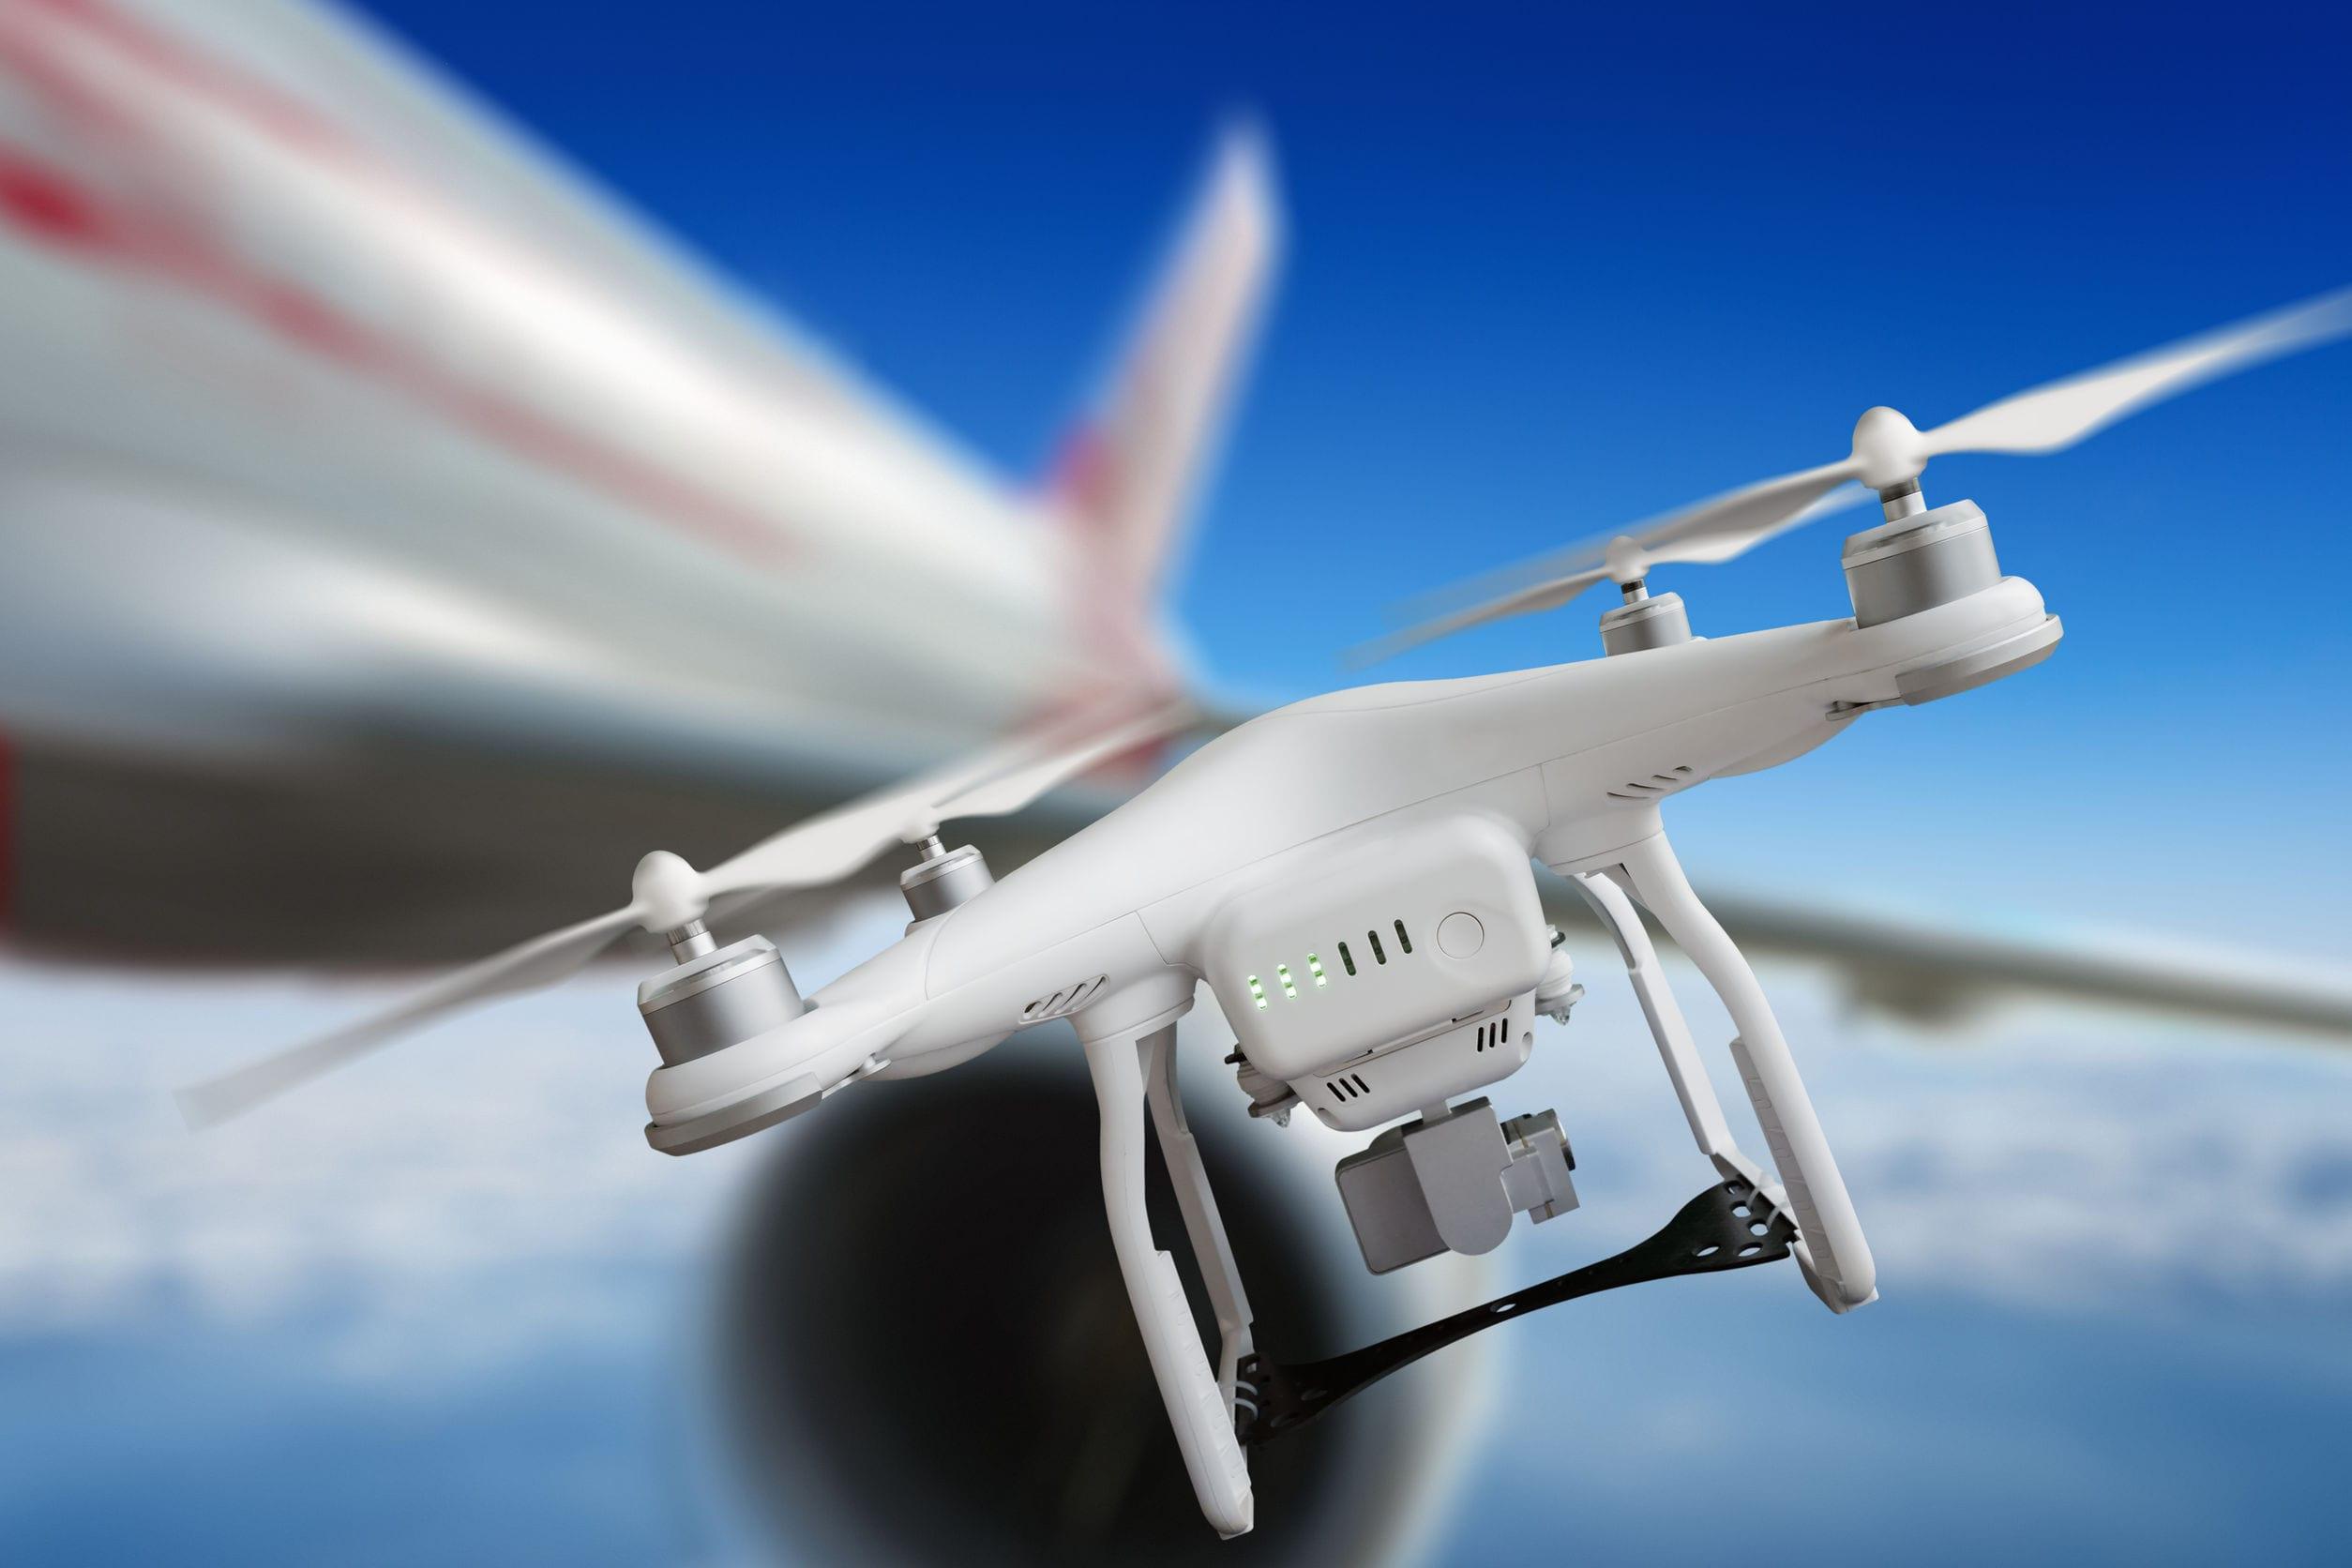 https://niss.gov.mn/wp-content/uploads/2021/08/drone-airplane.jpg